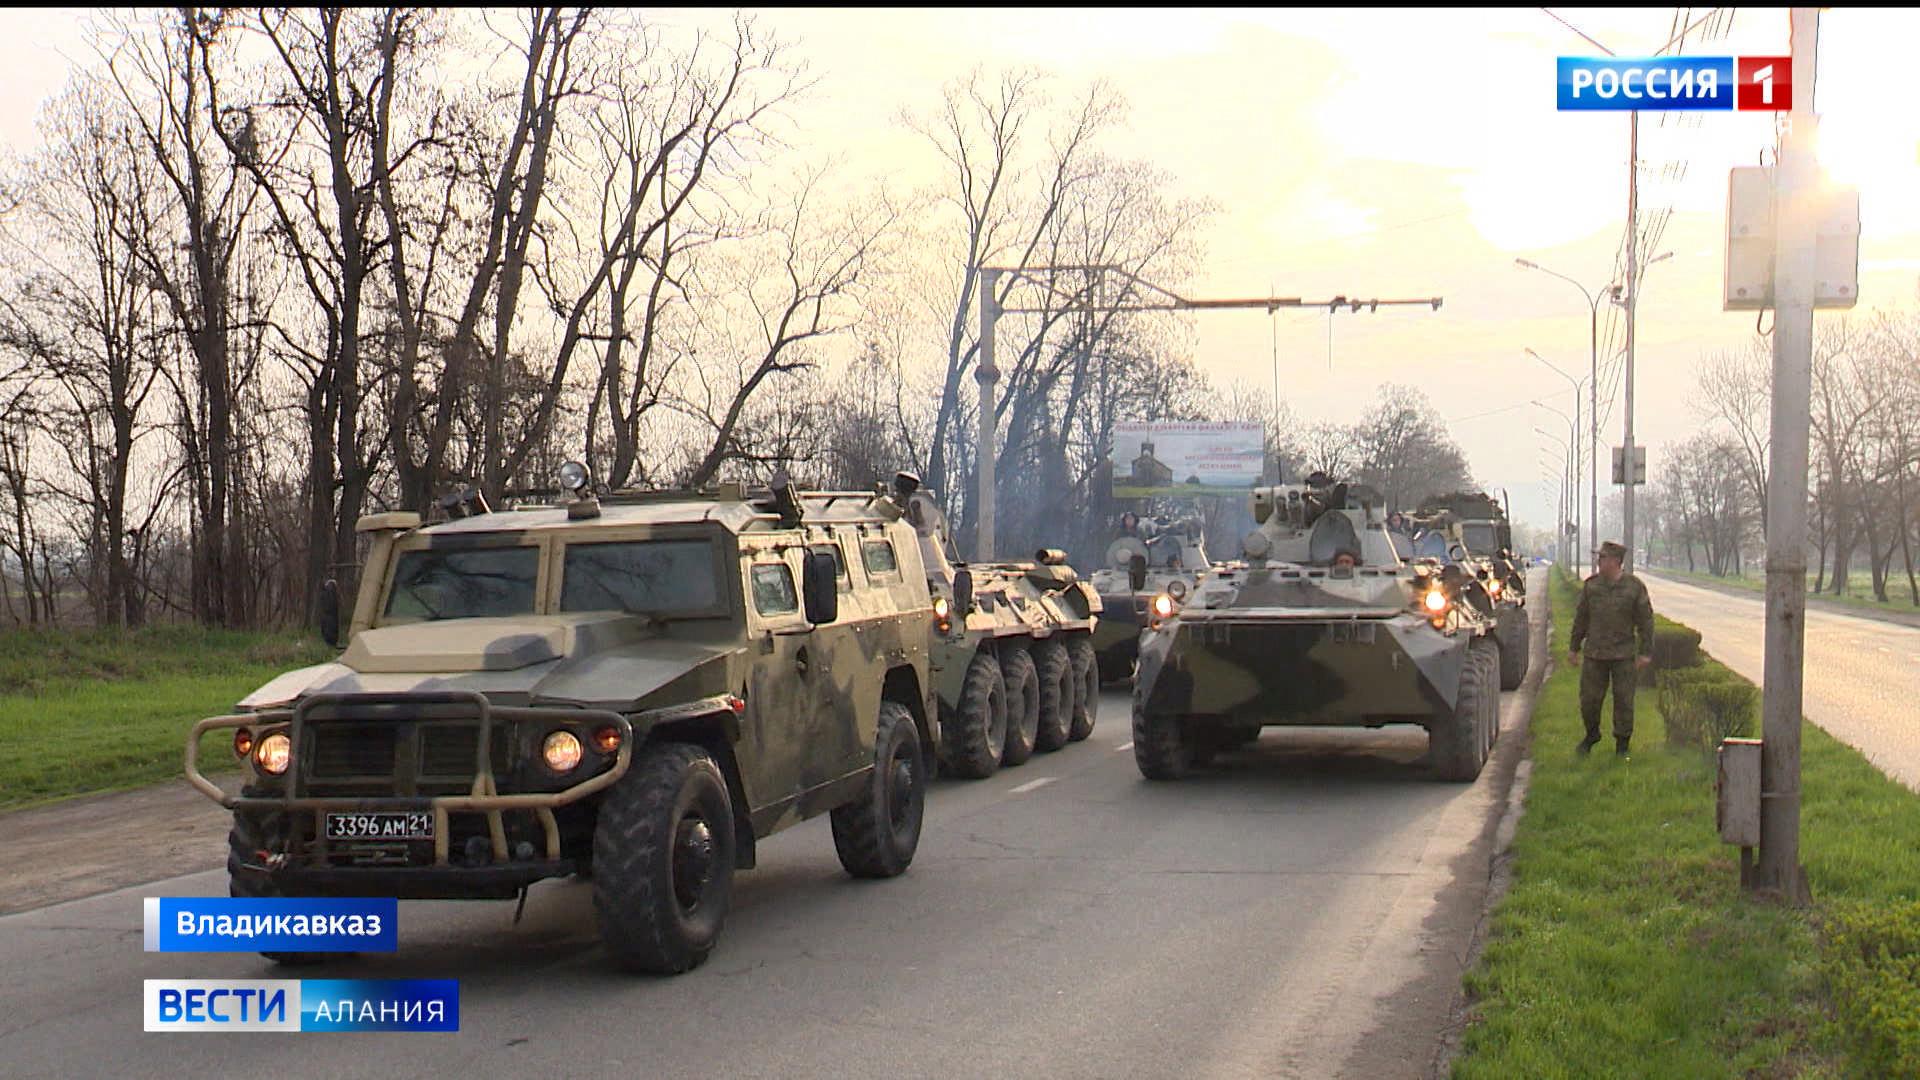 Во Владикавказе начались репетиции парада Победы